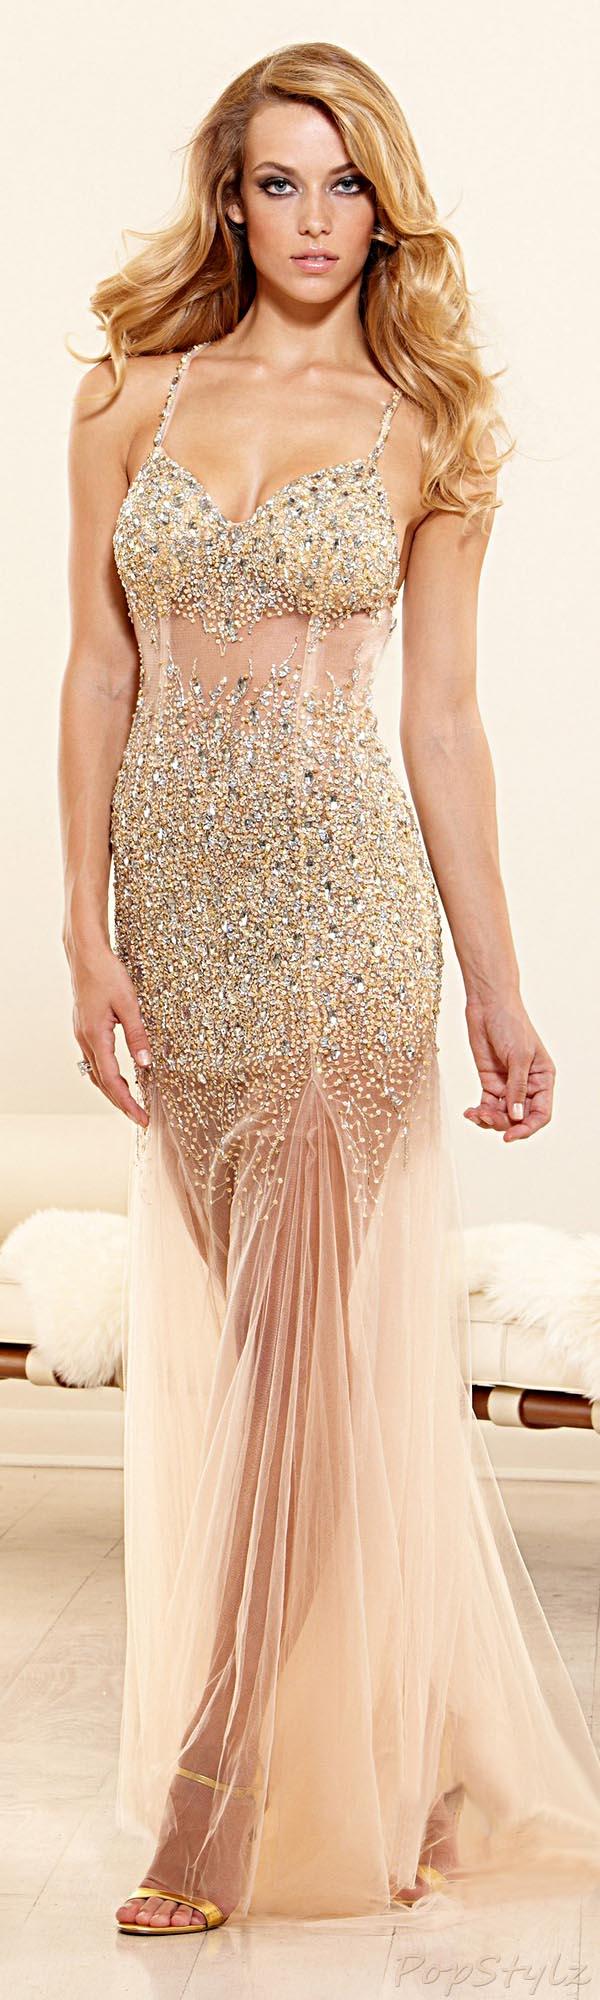 Terani Couture P3131 Dress